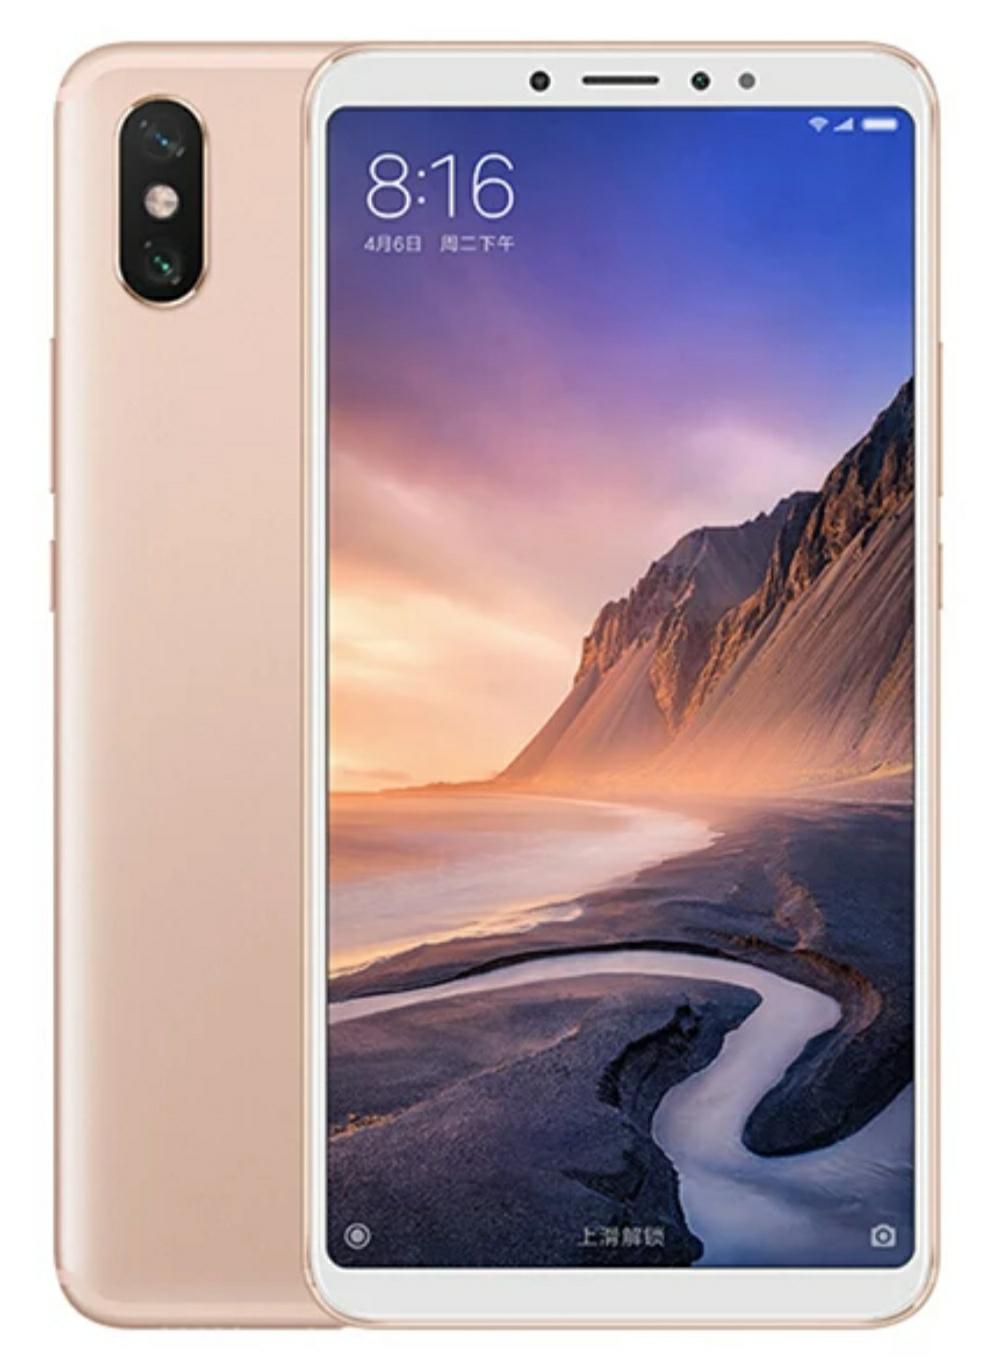 Xiaomi Mi Max 3 - 4/64GB ROM (a su mínimo histórico)